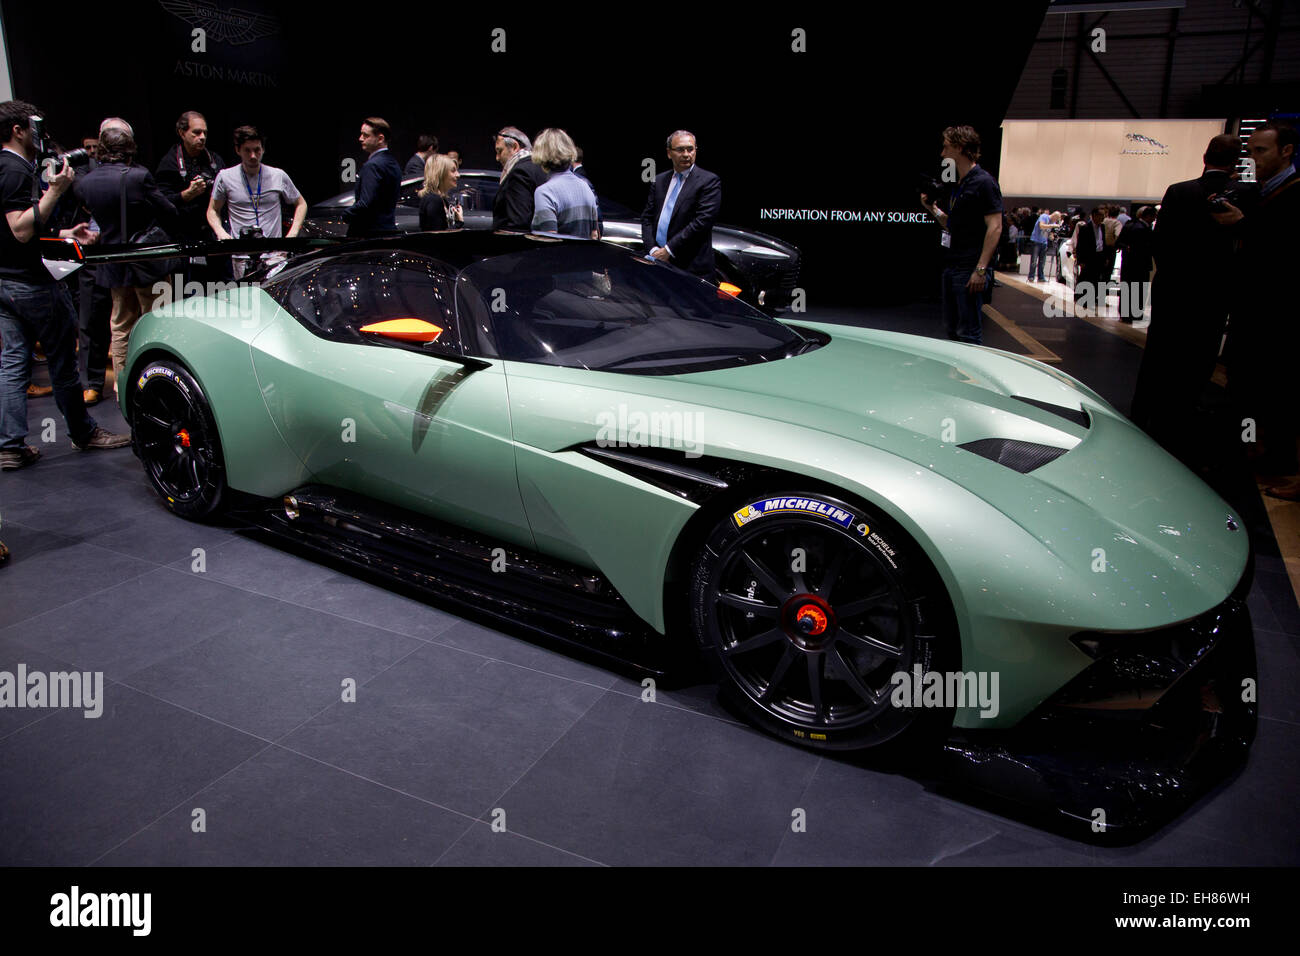 Aston Martin Vulcan shown at the Geneva Motor Show 2015 - Stock Image